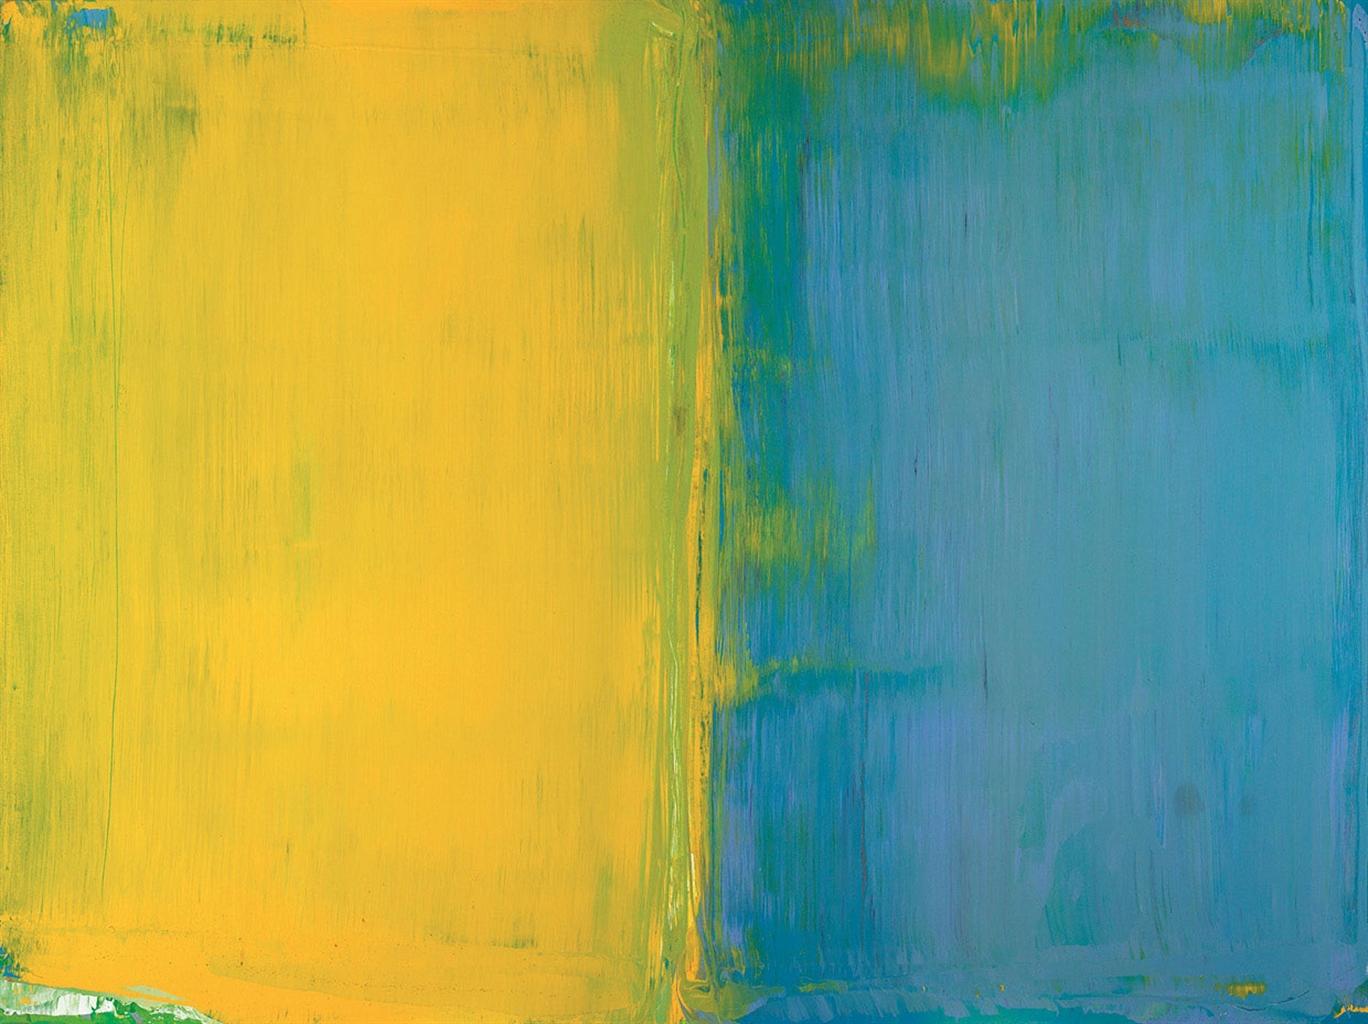 David Diao-The Finished Edge-1971